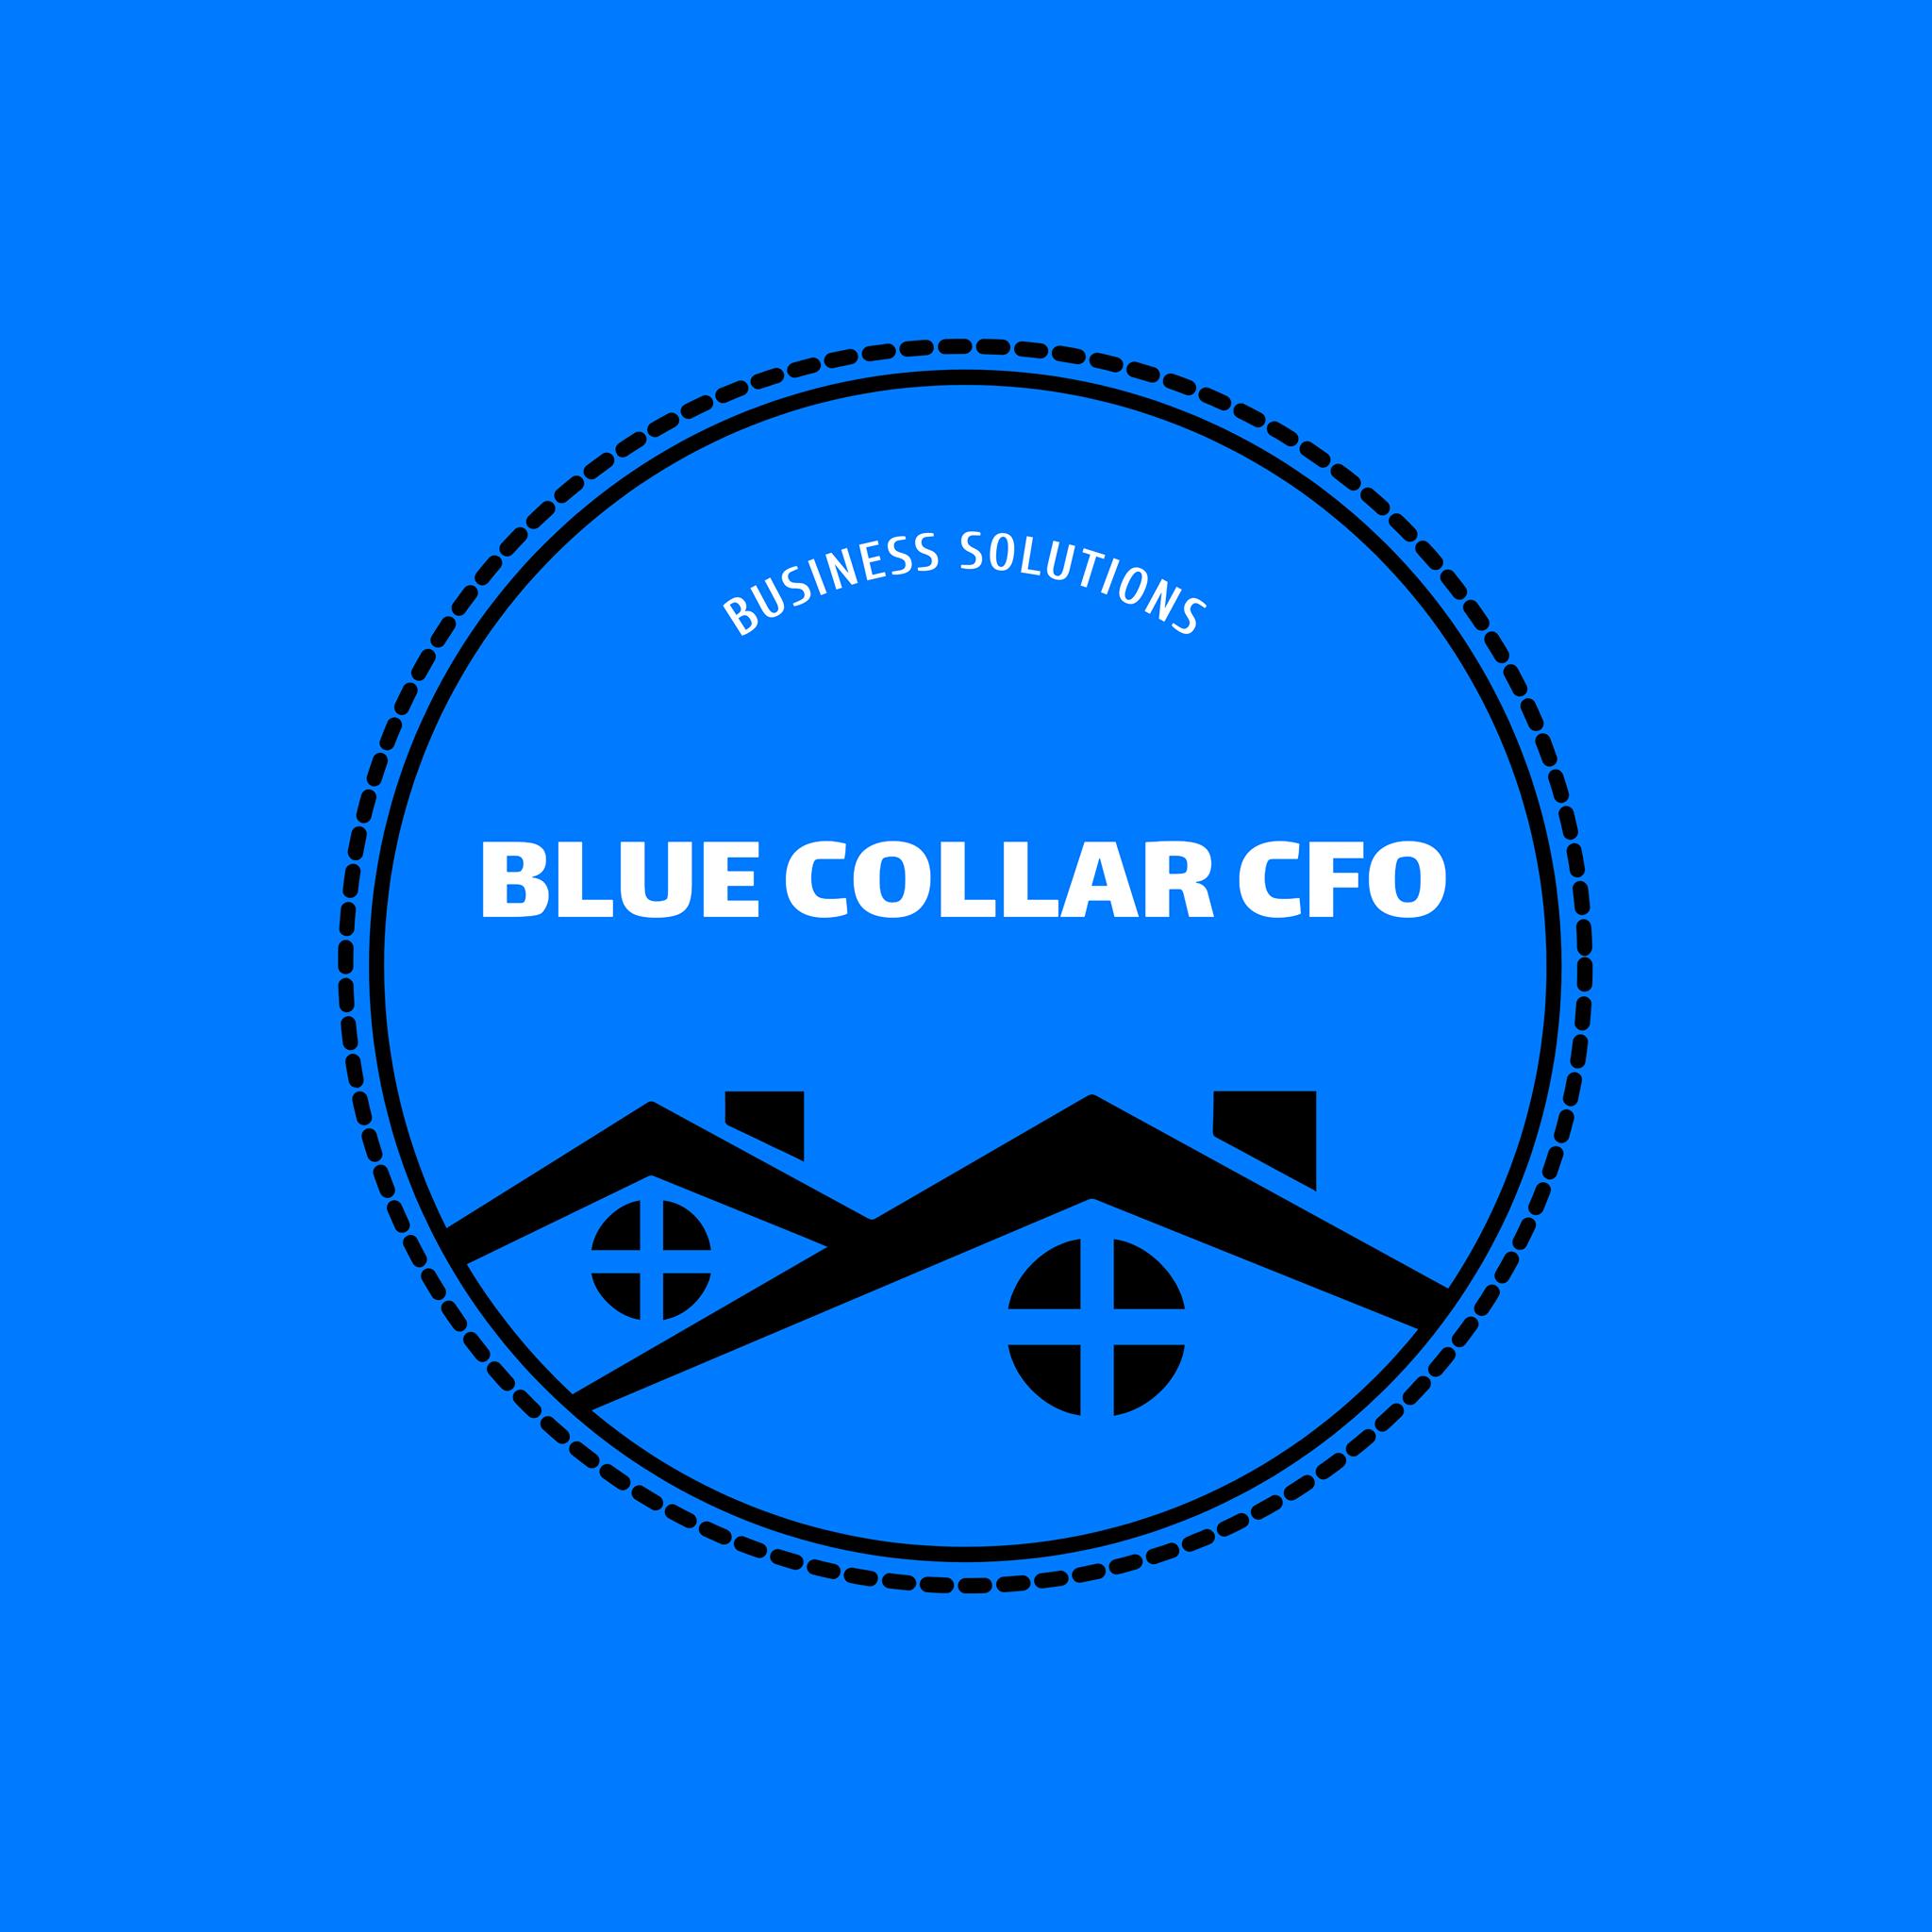 The Blue Collar CFO